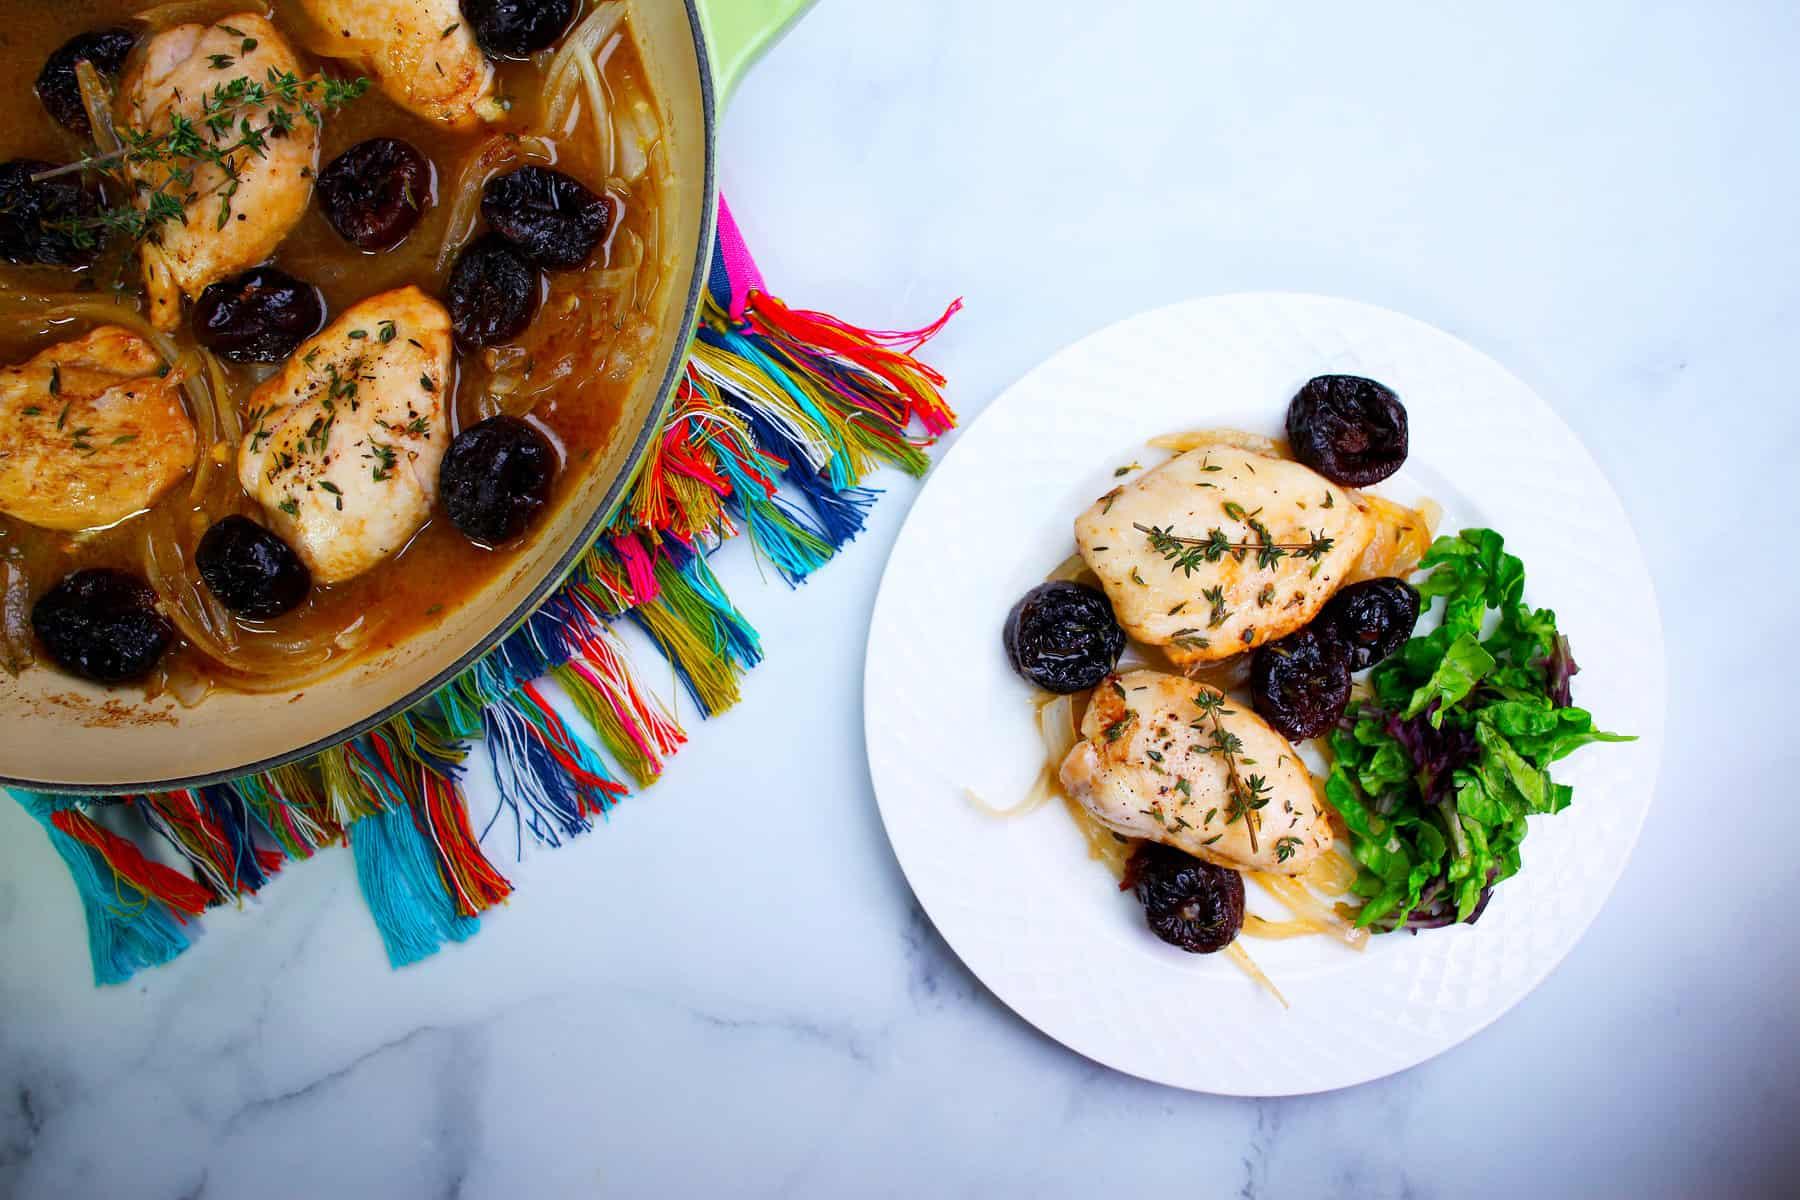 Braised Chicken with Onions & D'Noir Prunes